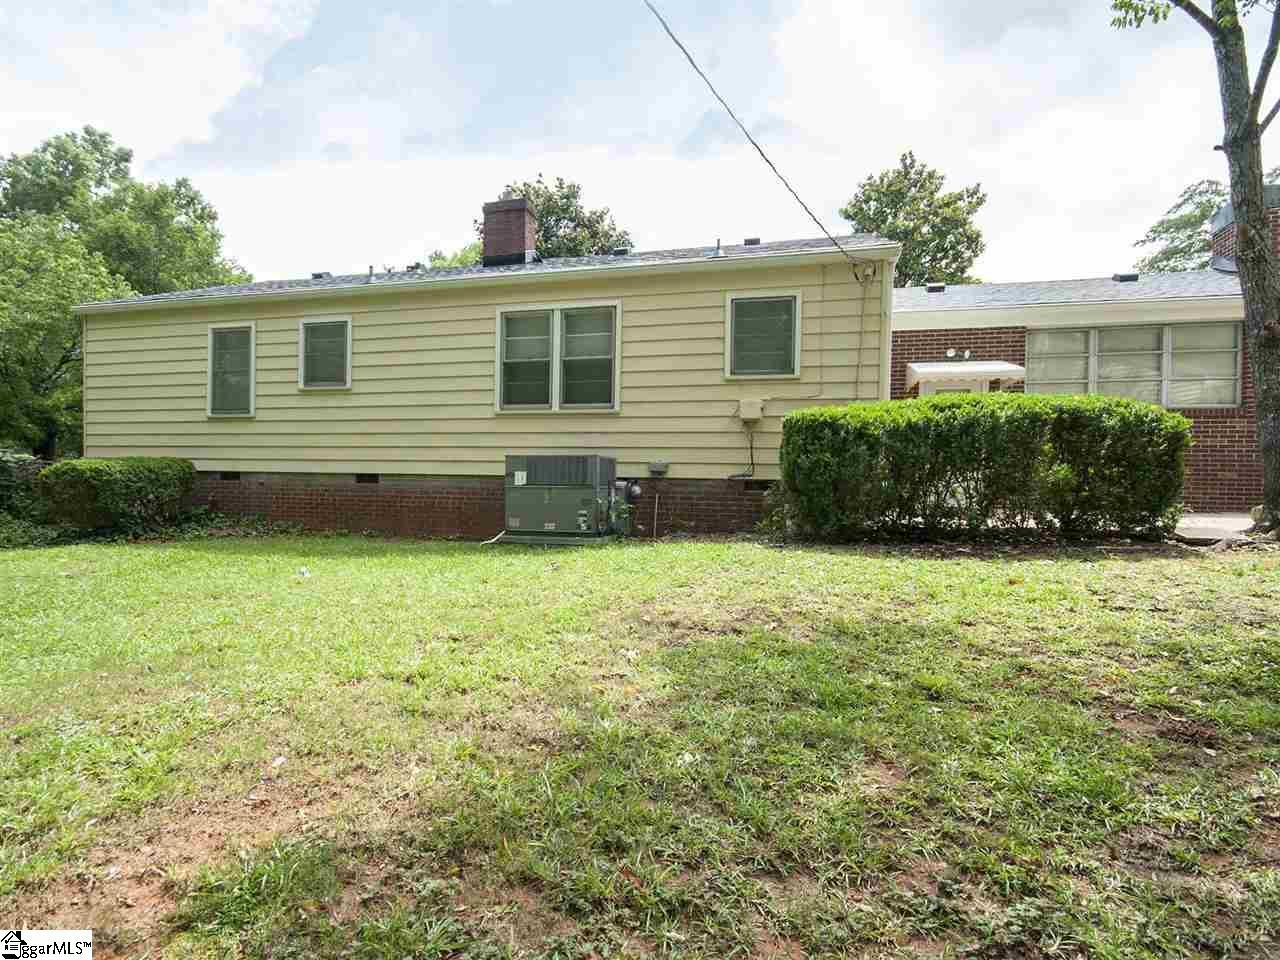 29 Farmington Greenville, SC 29605-4508